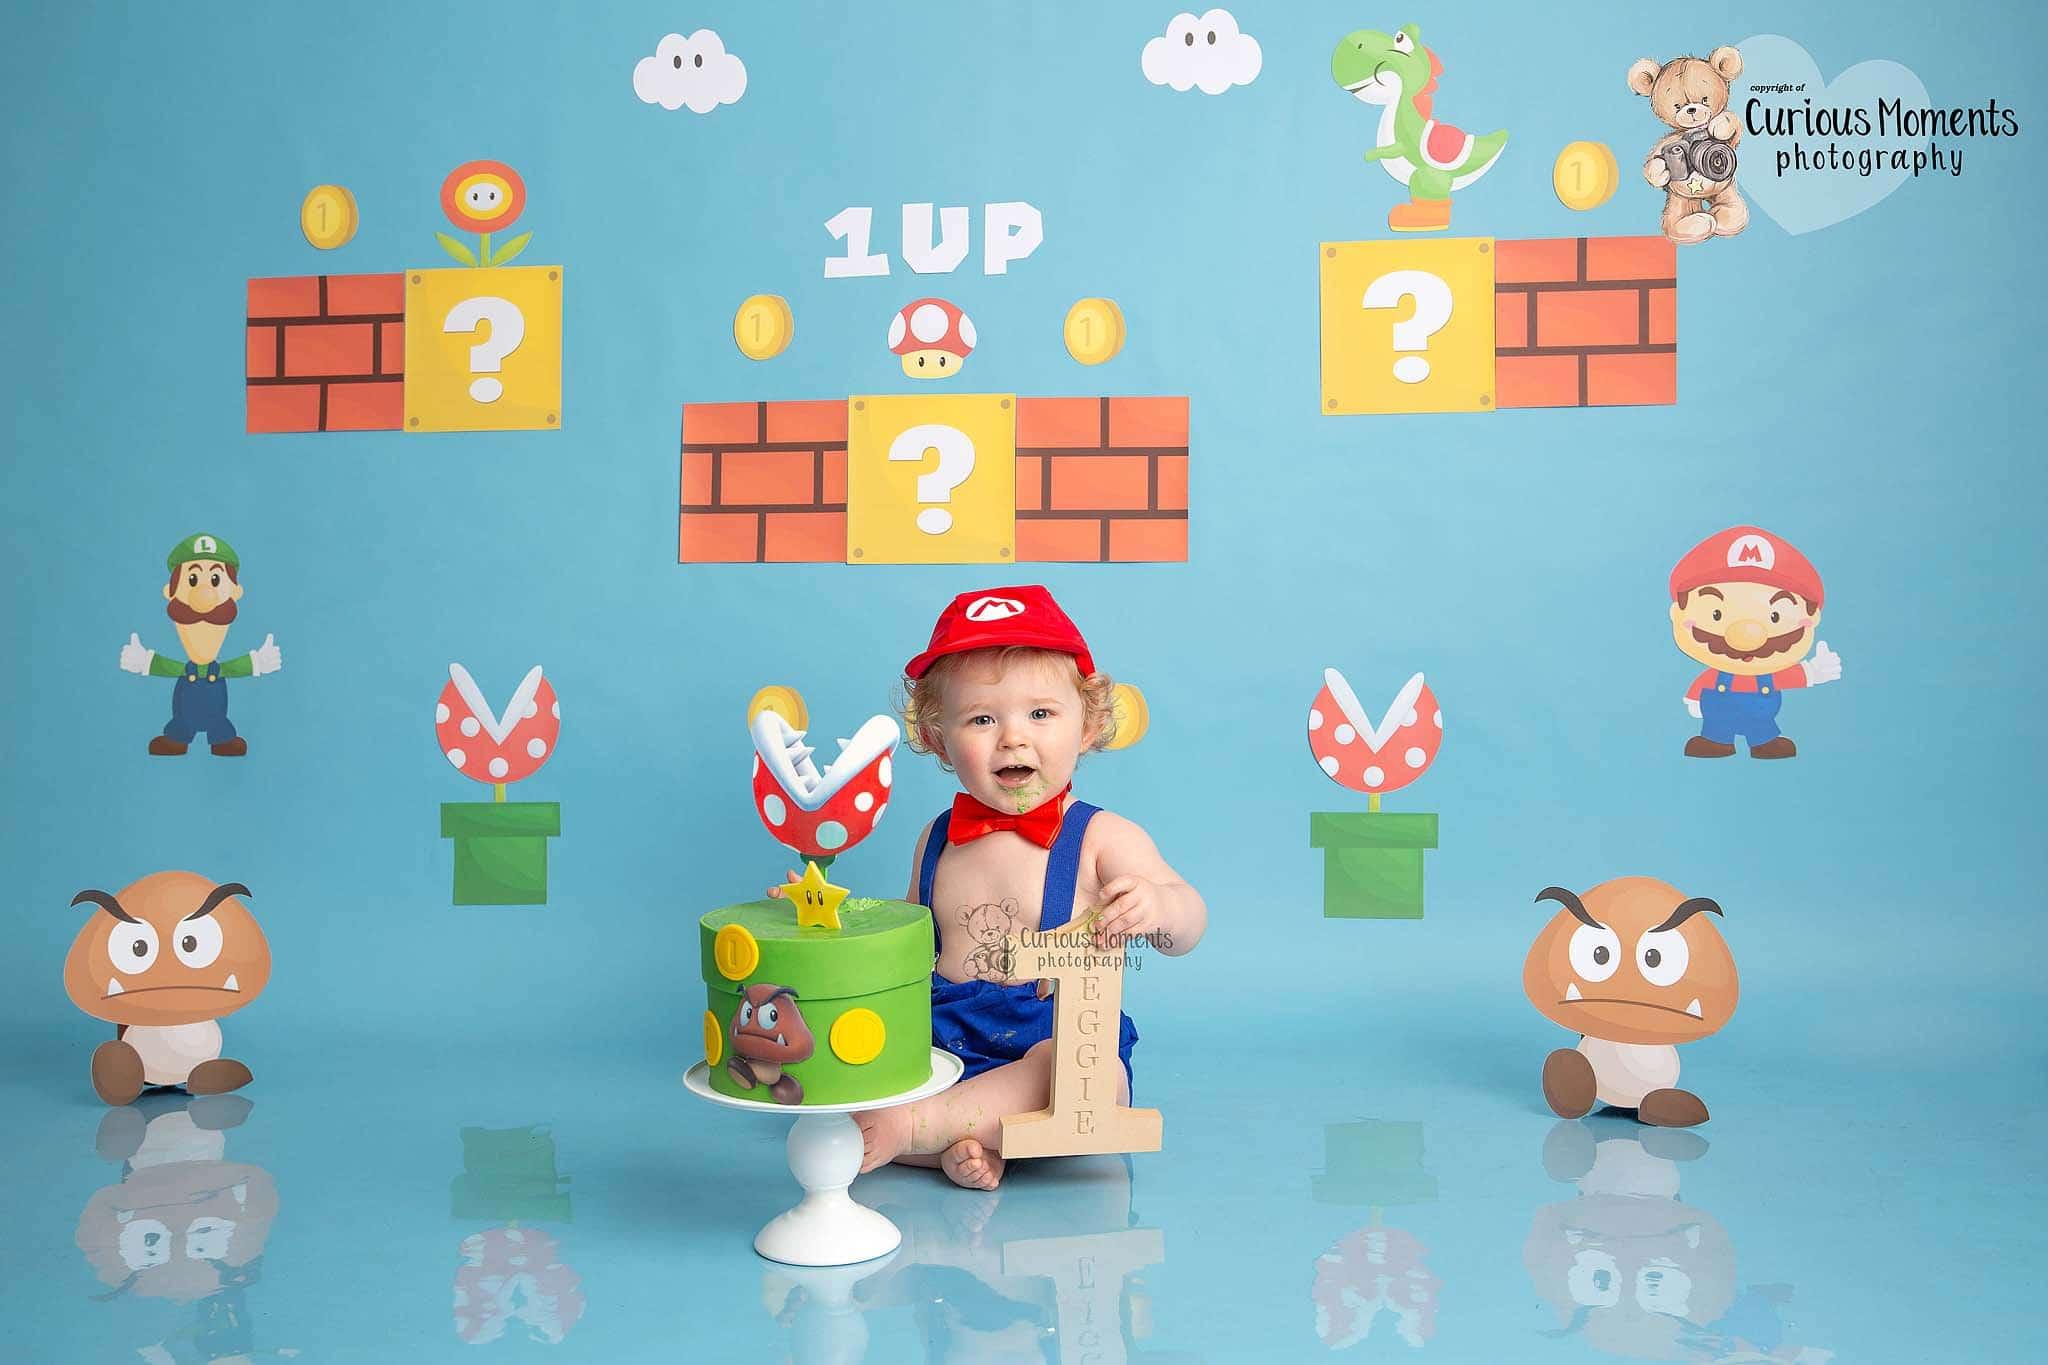 Retro game and Mario inspired cake smash for baby boys' 1st birthday cake smash